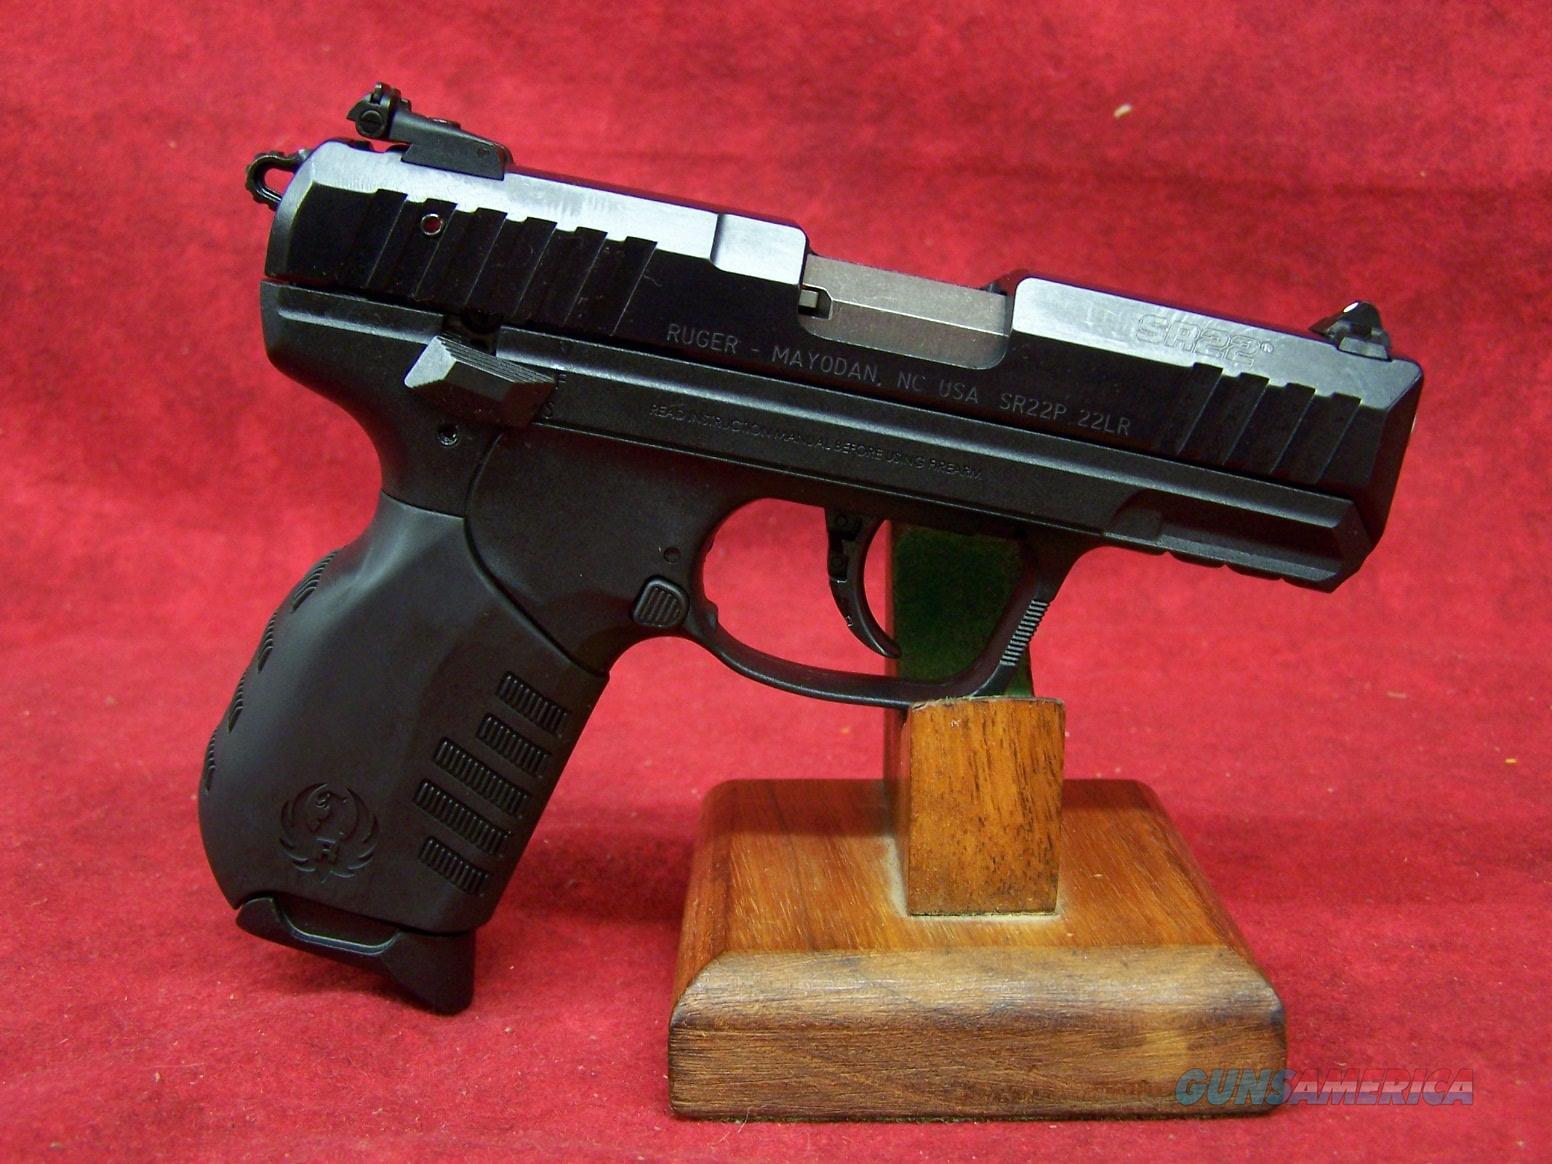 "Ruger SR22PB 22LR 3.5"" Barrel (03600)  Guns > Pistols > Ruger Semi-Auto Pistols > SR Family > SR22"